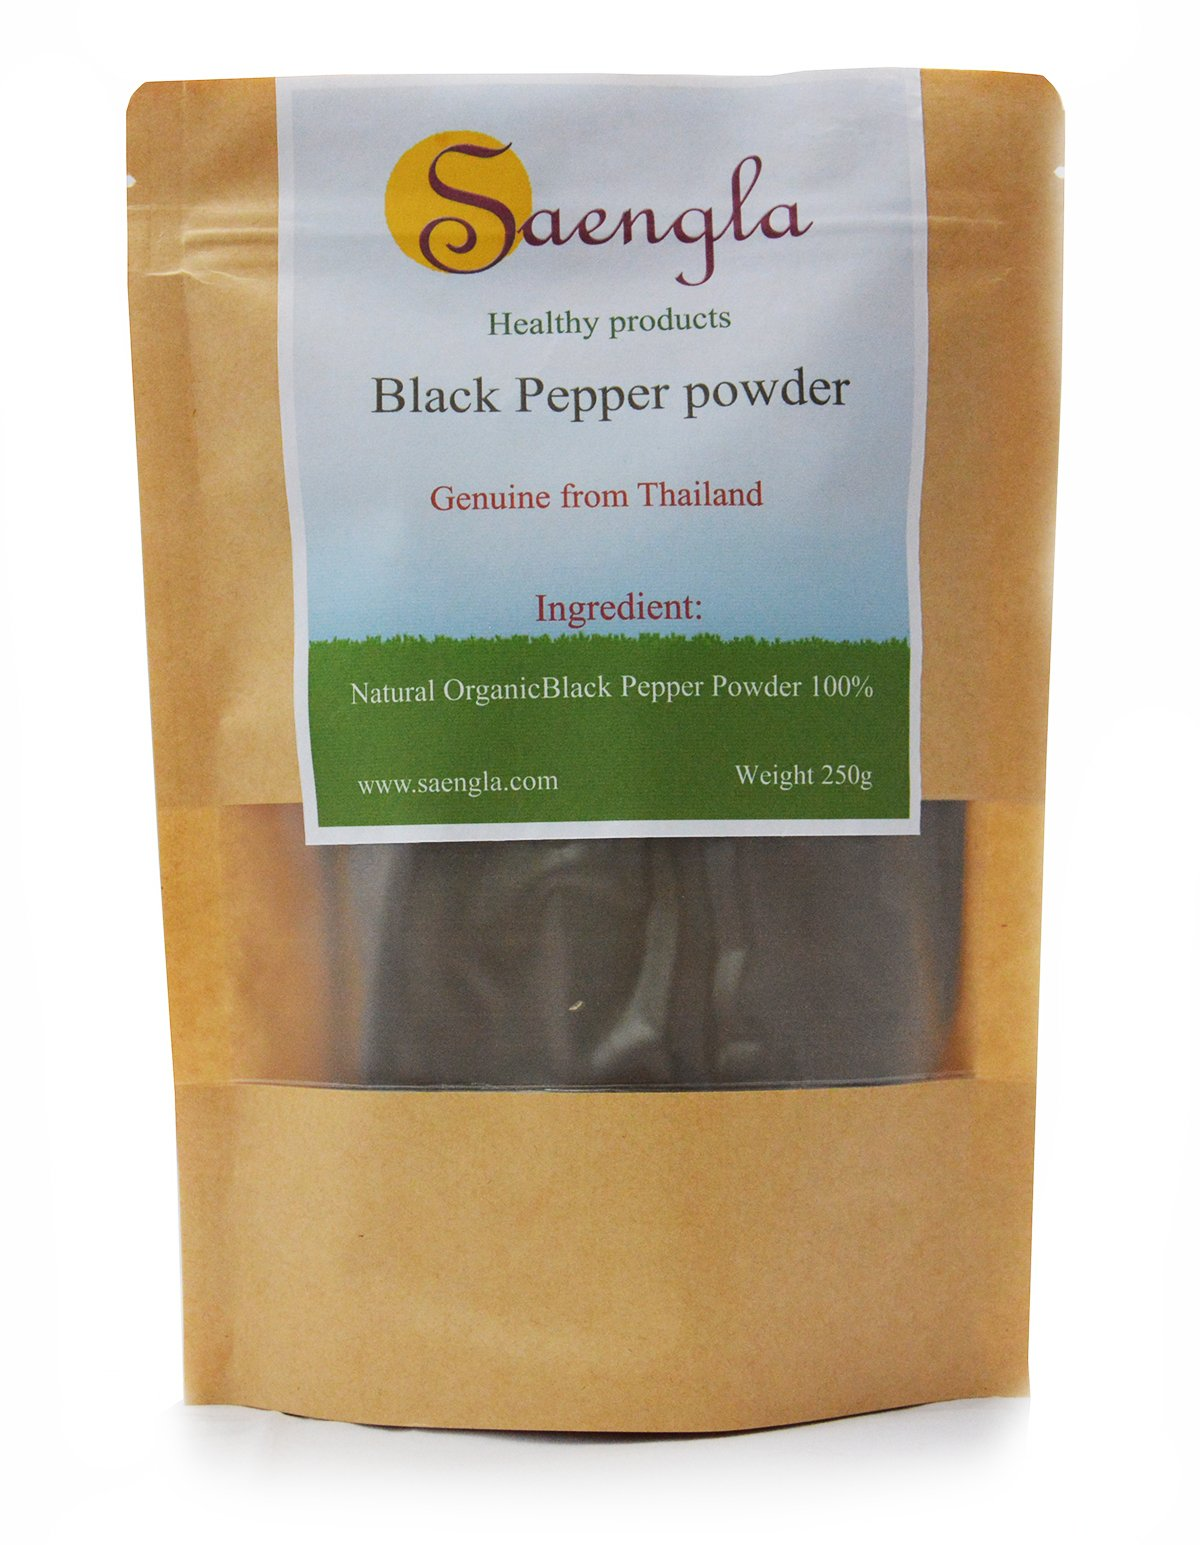 saengla Organic Black Pepper powder 250g